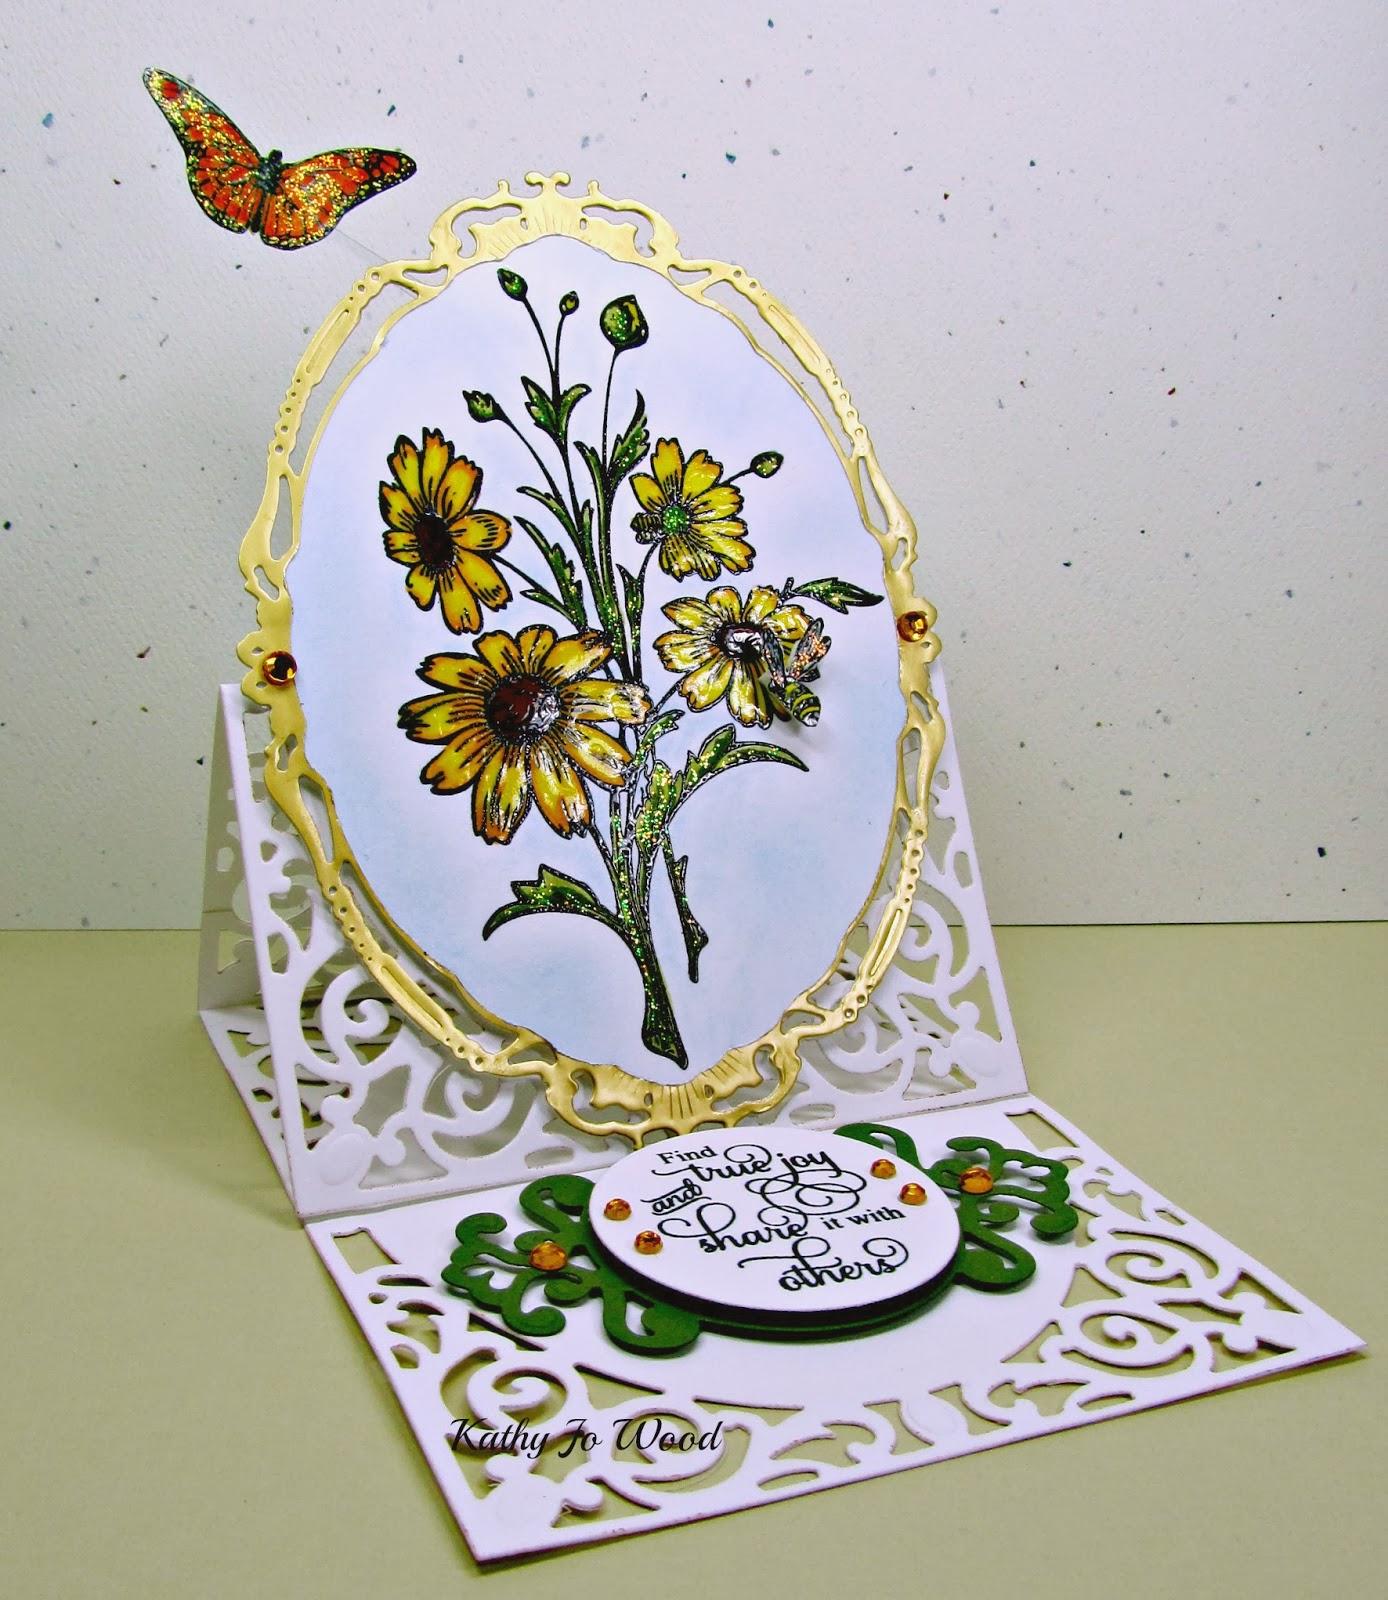 Black Eyed Susan, butterflies, card, Filigree Delight, Just Rite, JustRite, opulent ovals, parisian accents, Spellbinders, standard circles,